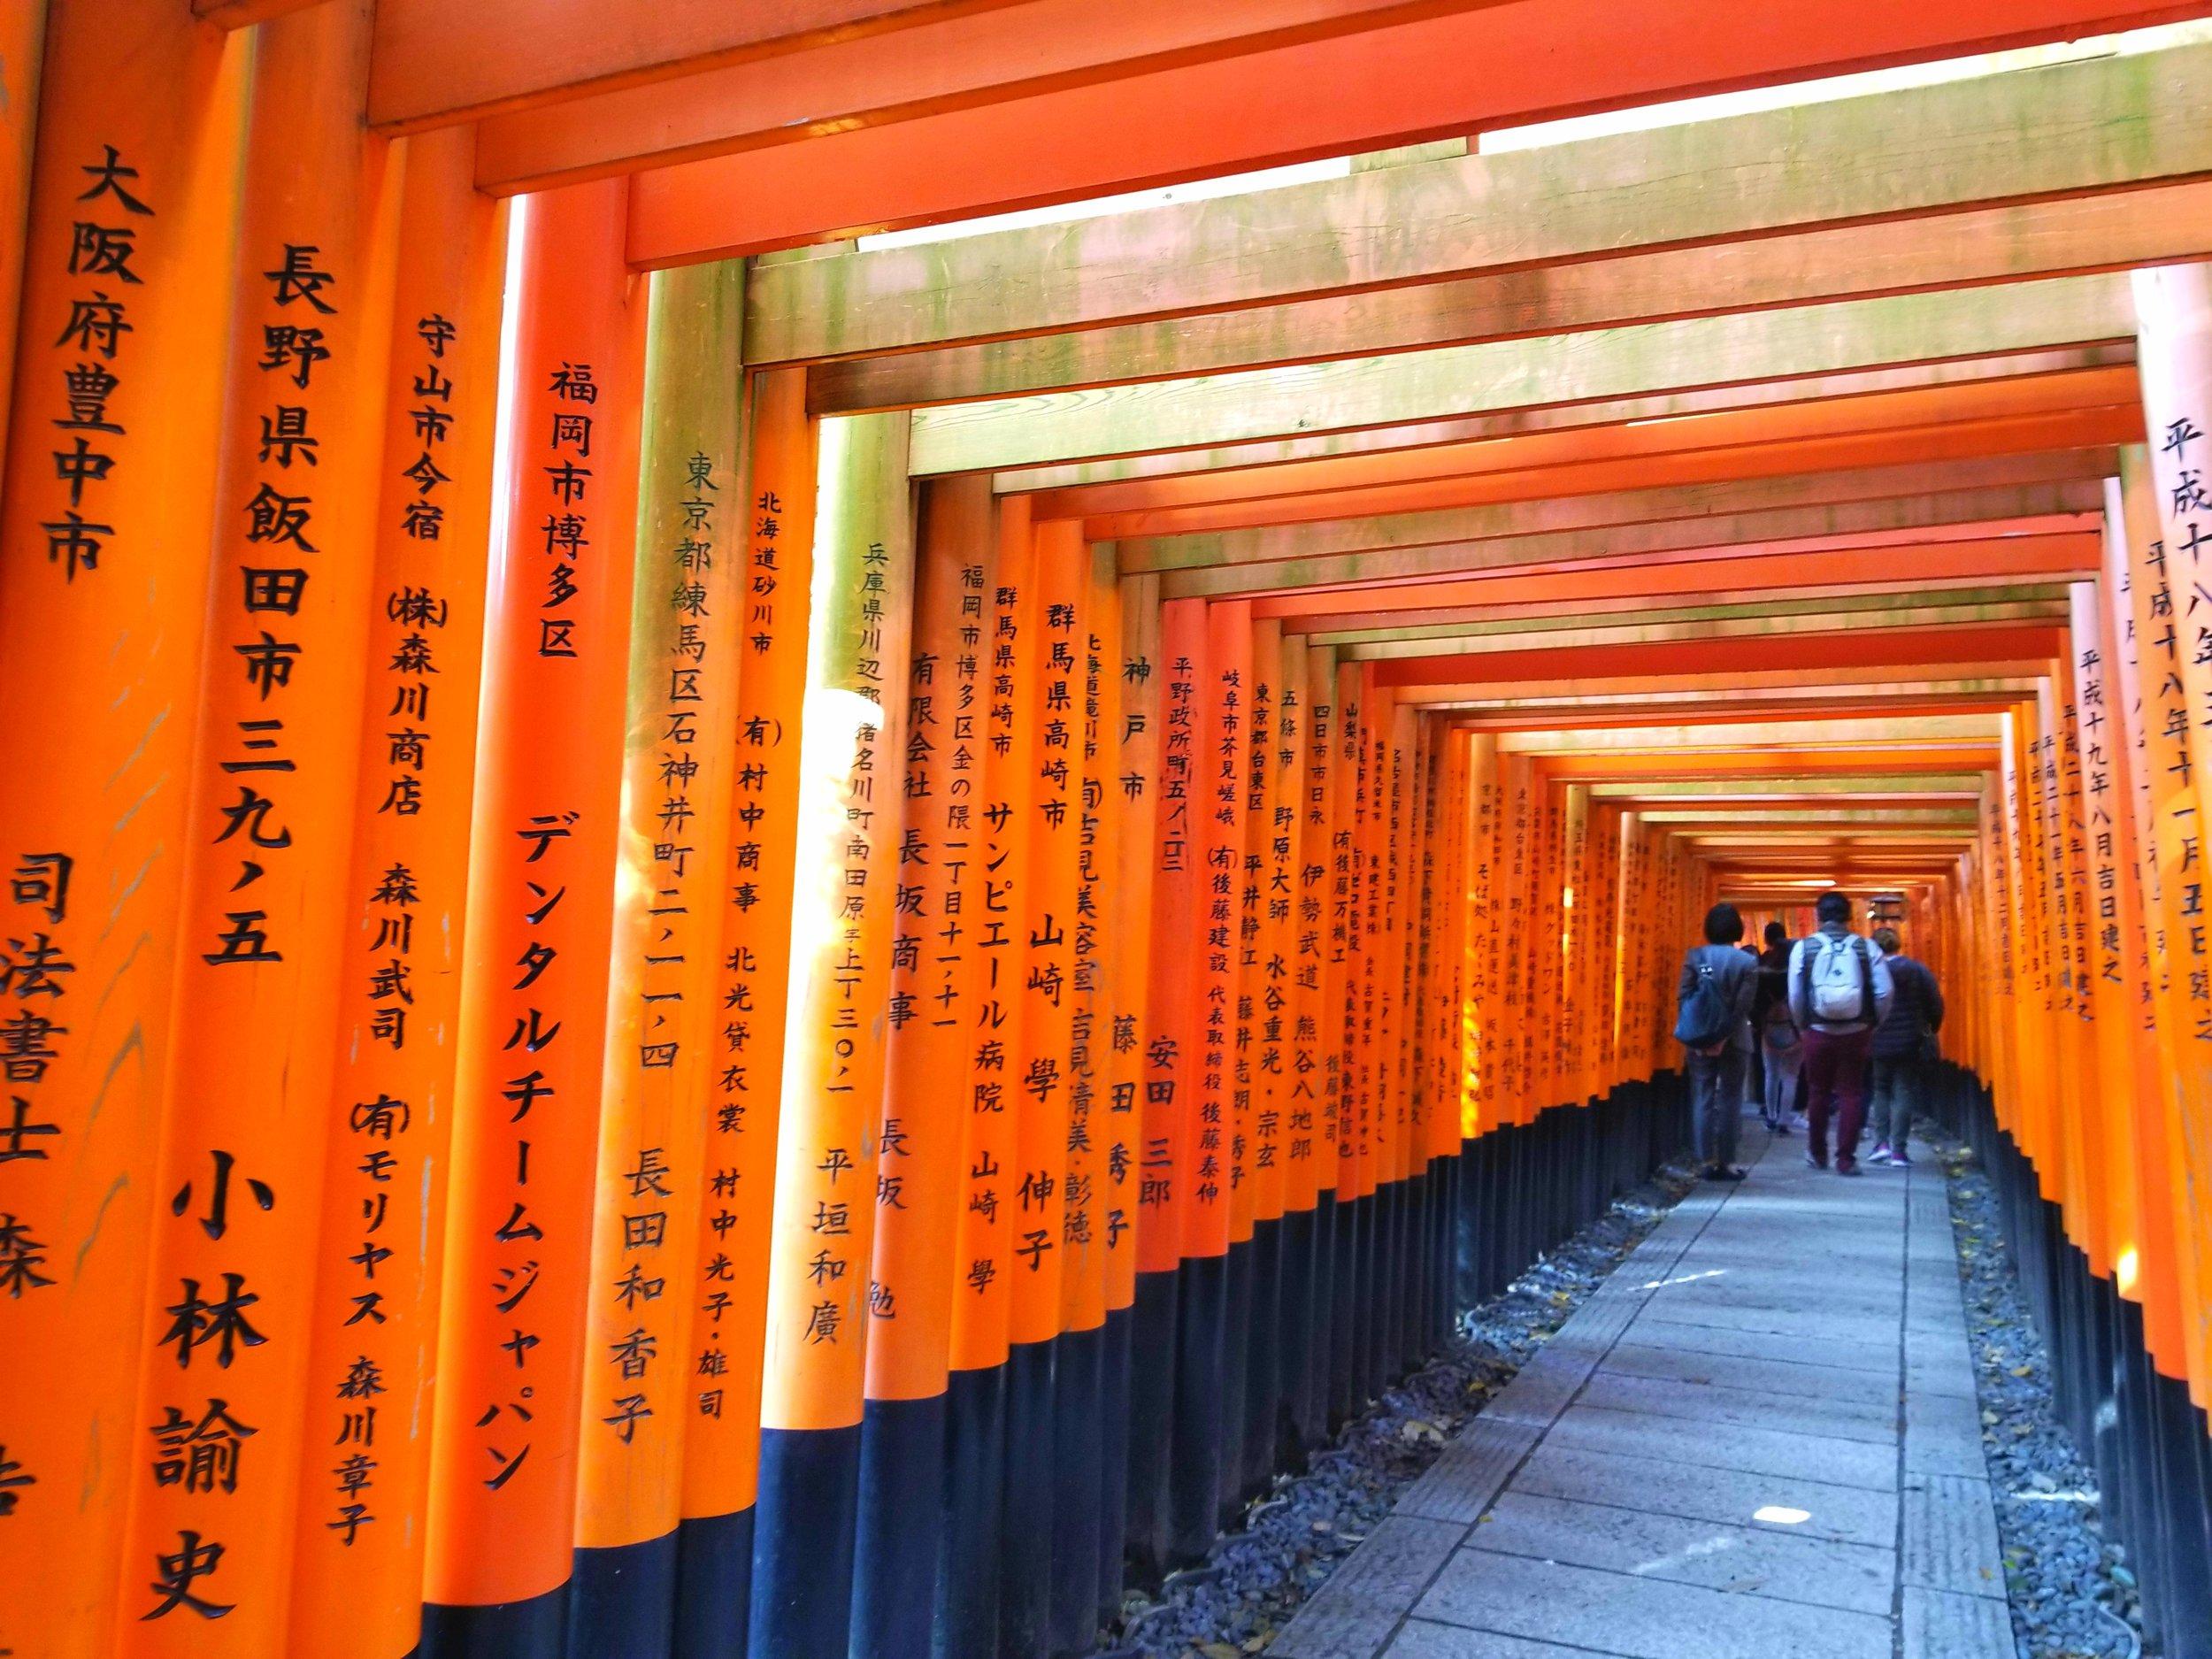 uprooted-traveler-fushimi-inari-vegan-guide-kyoto.jpg